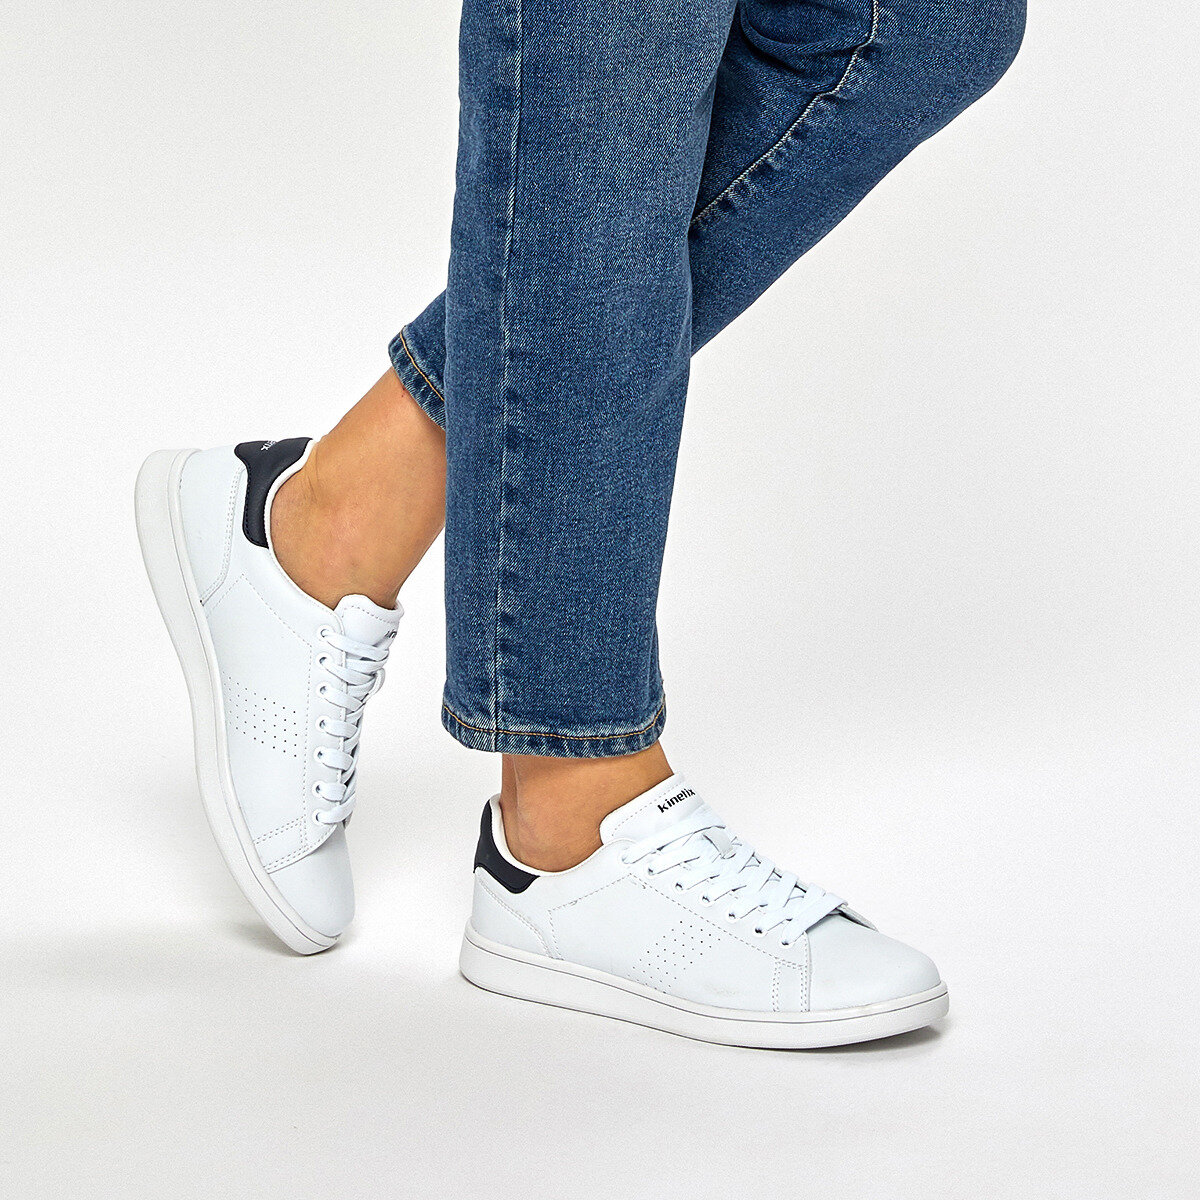 FLO PLAIN W 9PR Black Women 'S Sneaker Shoes KINETIX